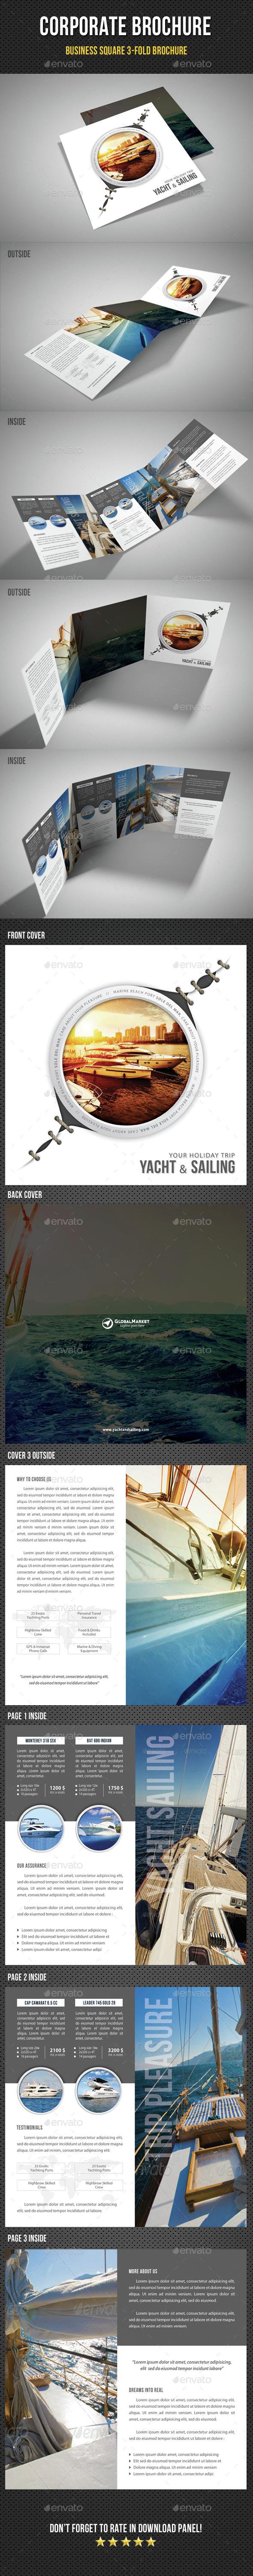 Yacht Boat Sailing Square 3-Fold Brochure 04 - Brochures Print Templates